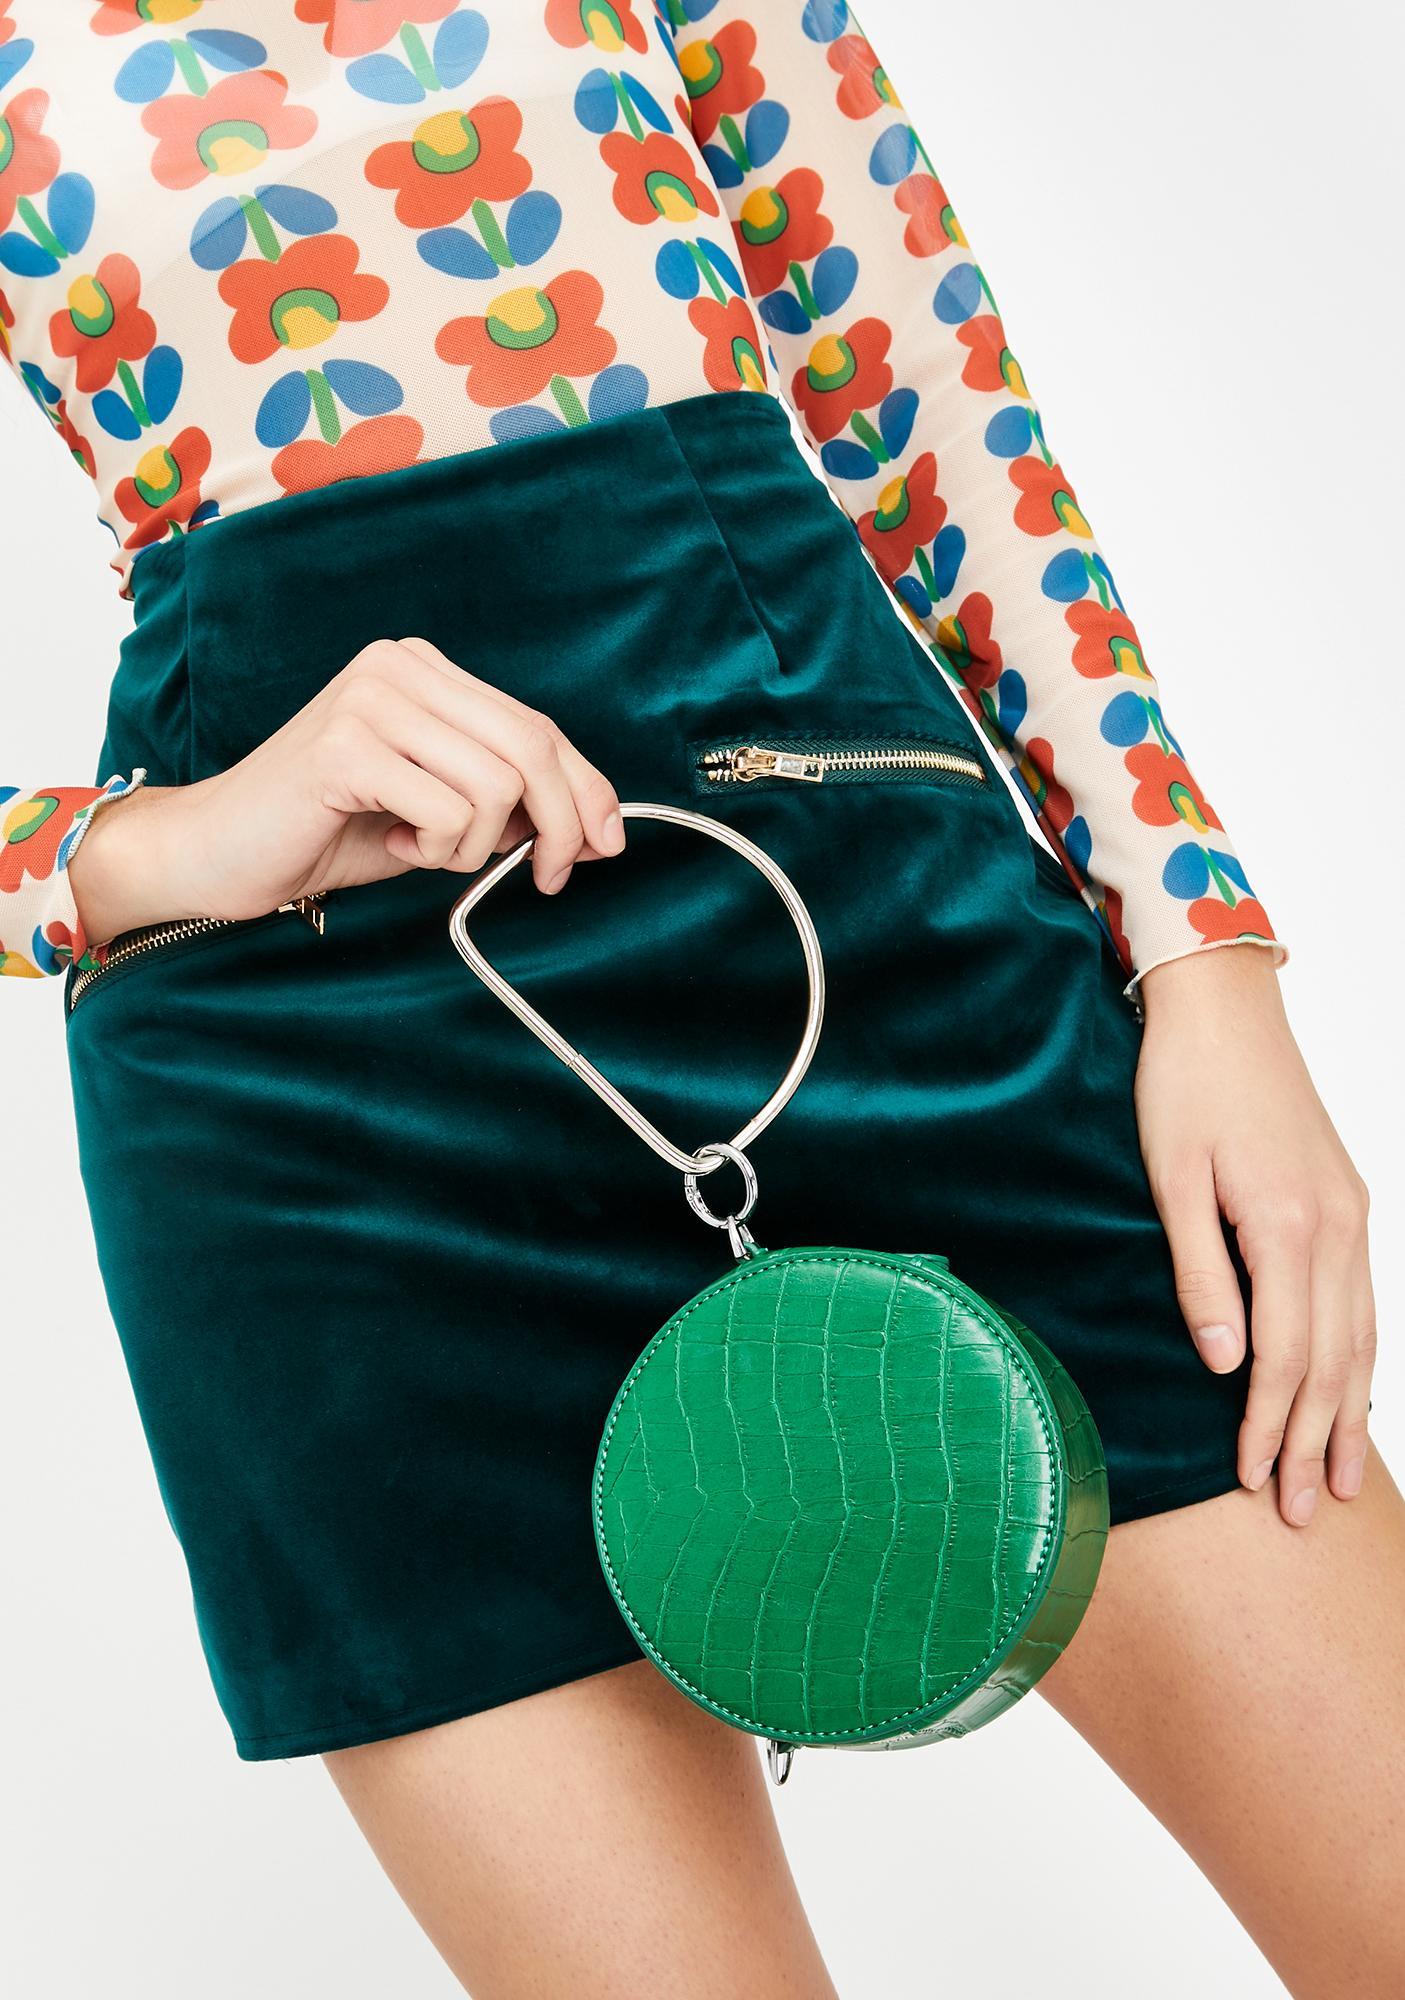 Ivy Fashion Clique Crossbody Purse